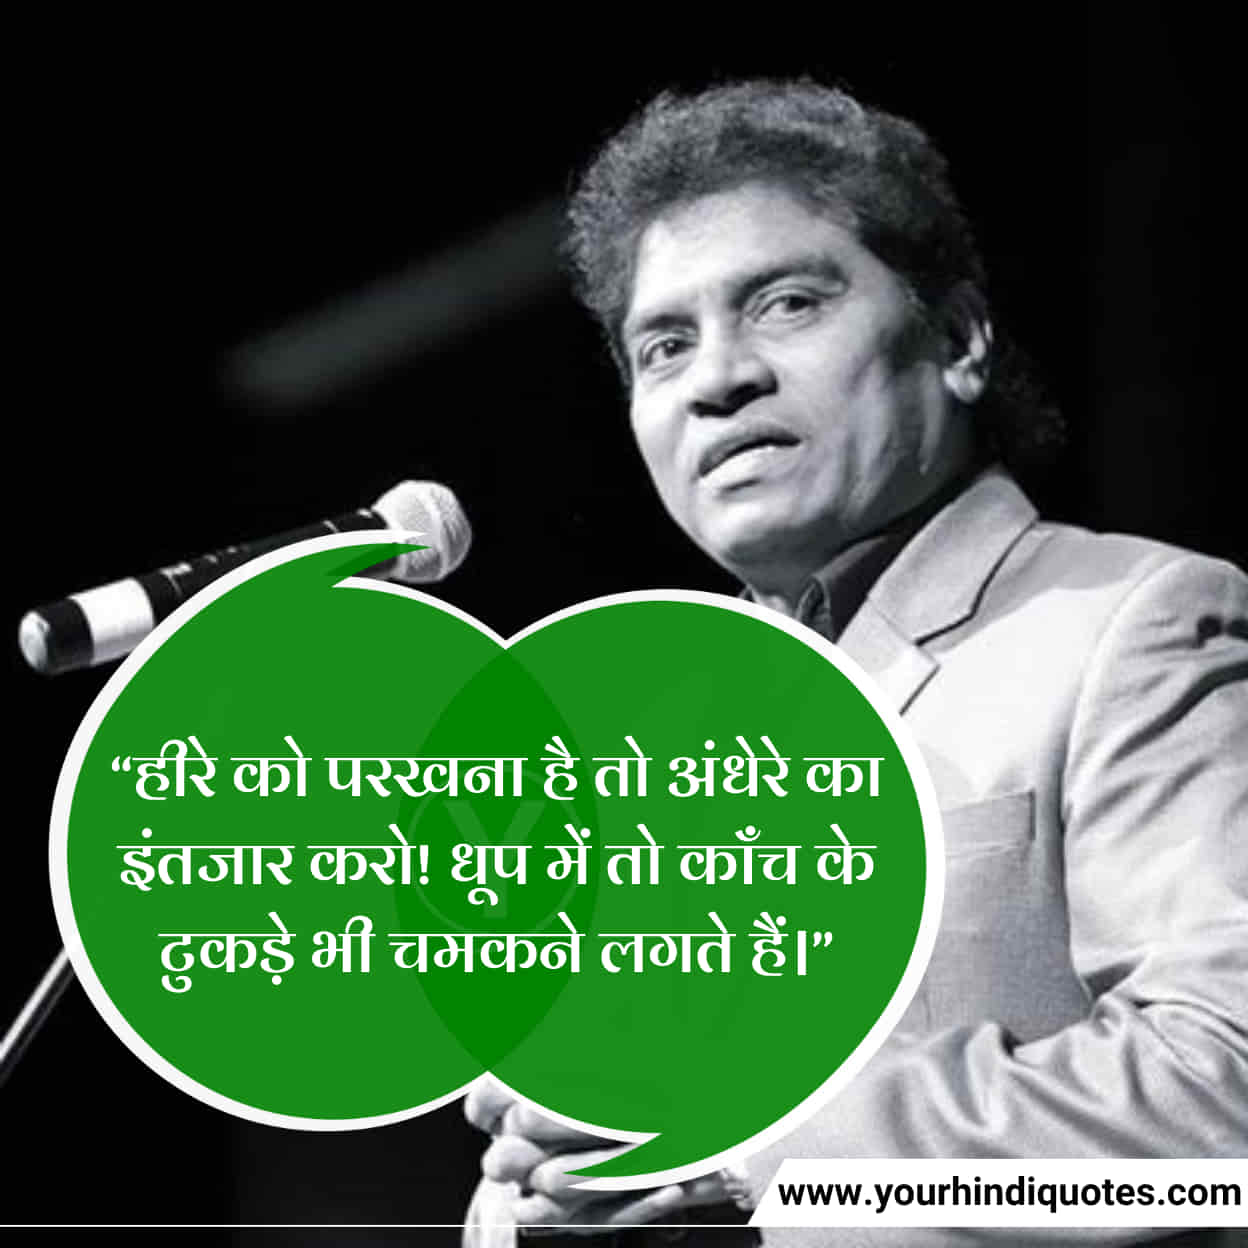 Hindi Whatsapp Motivational Status